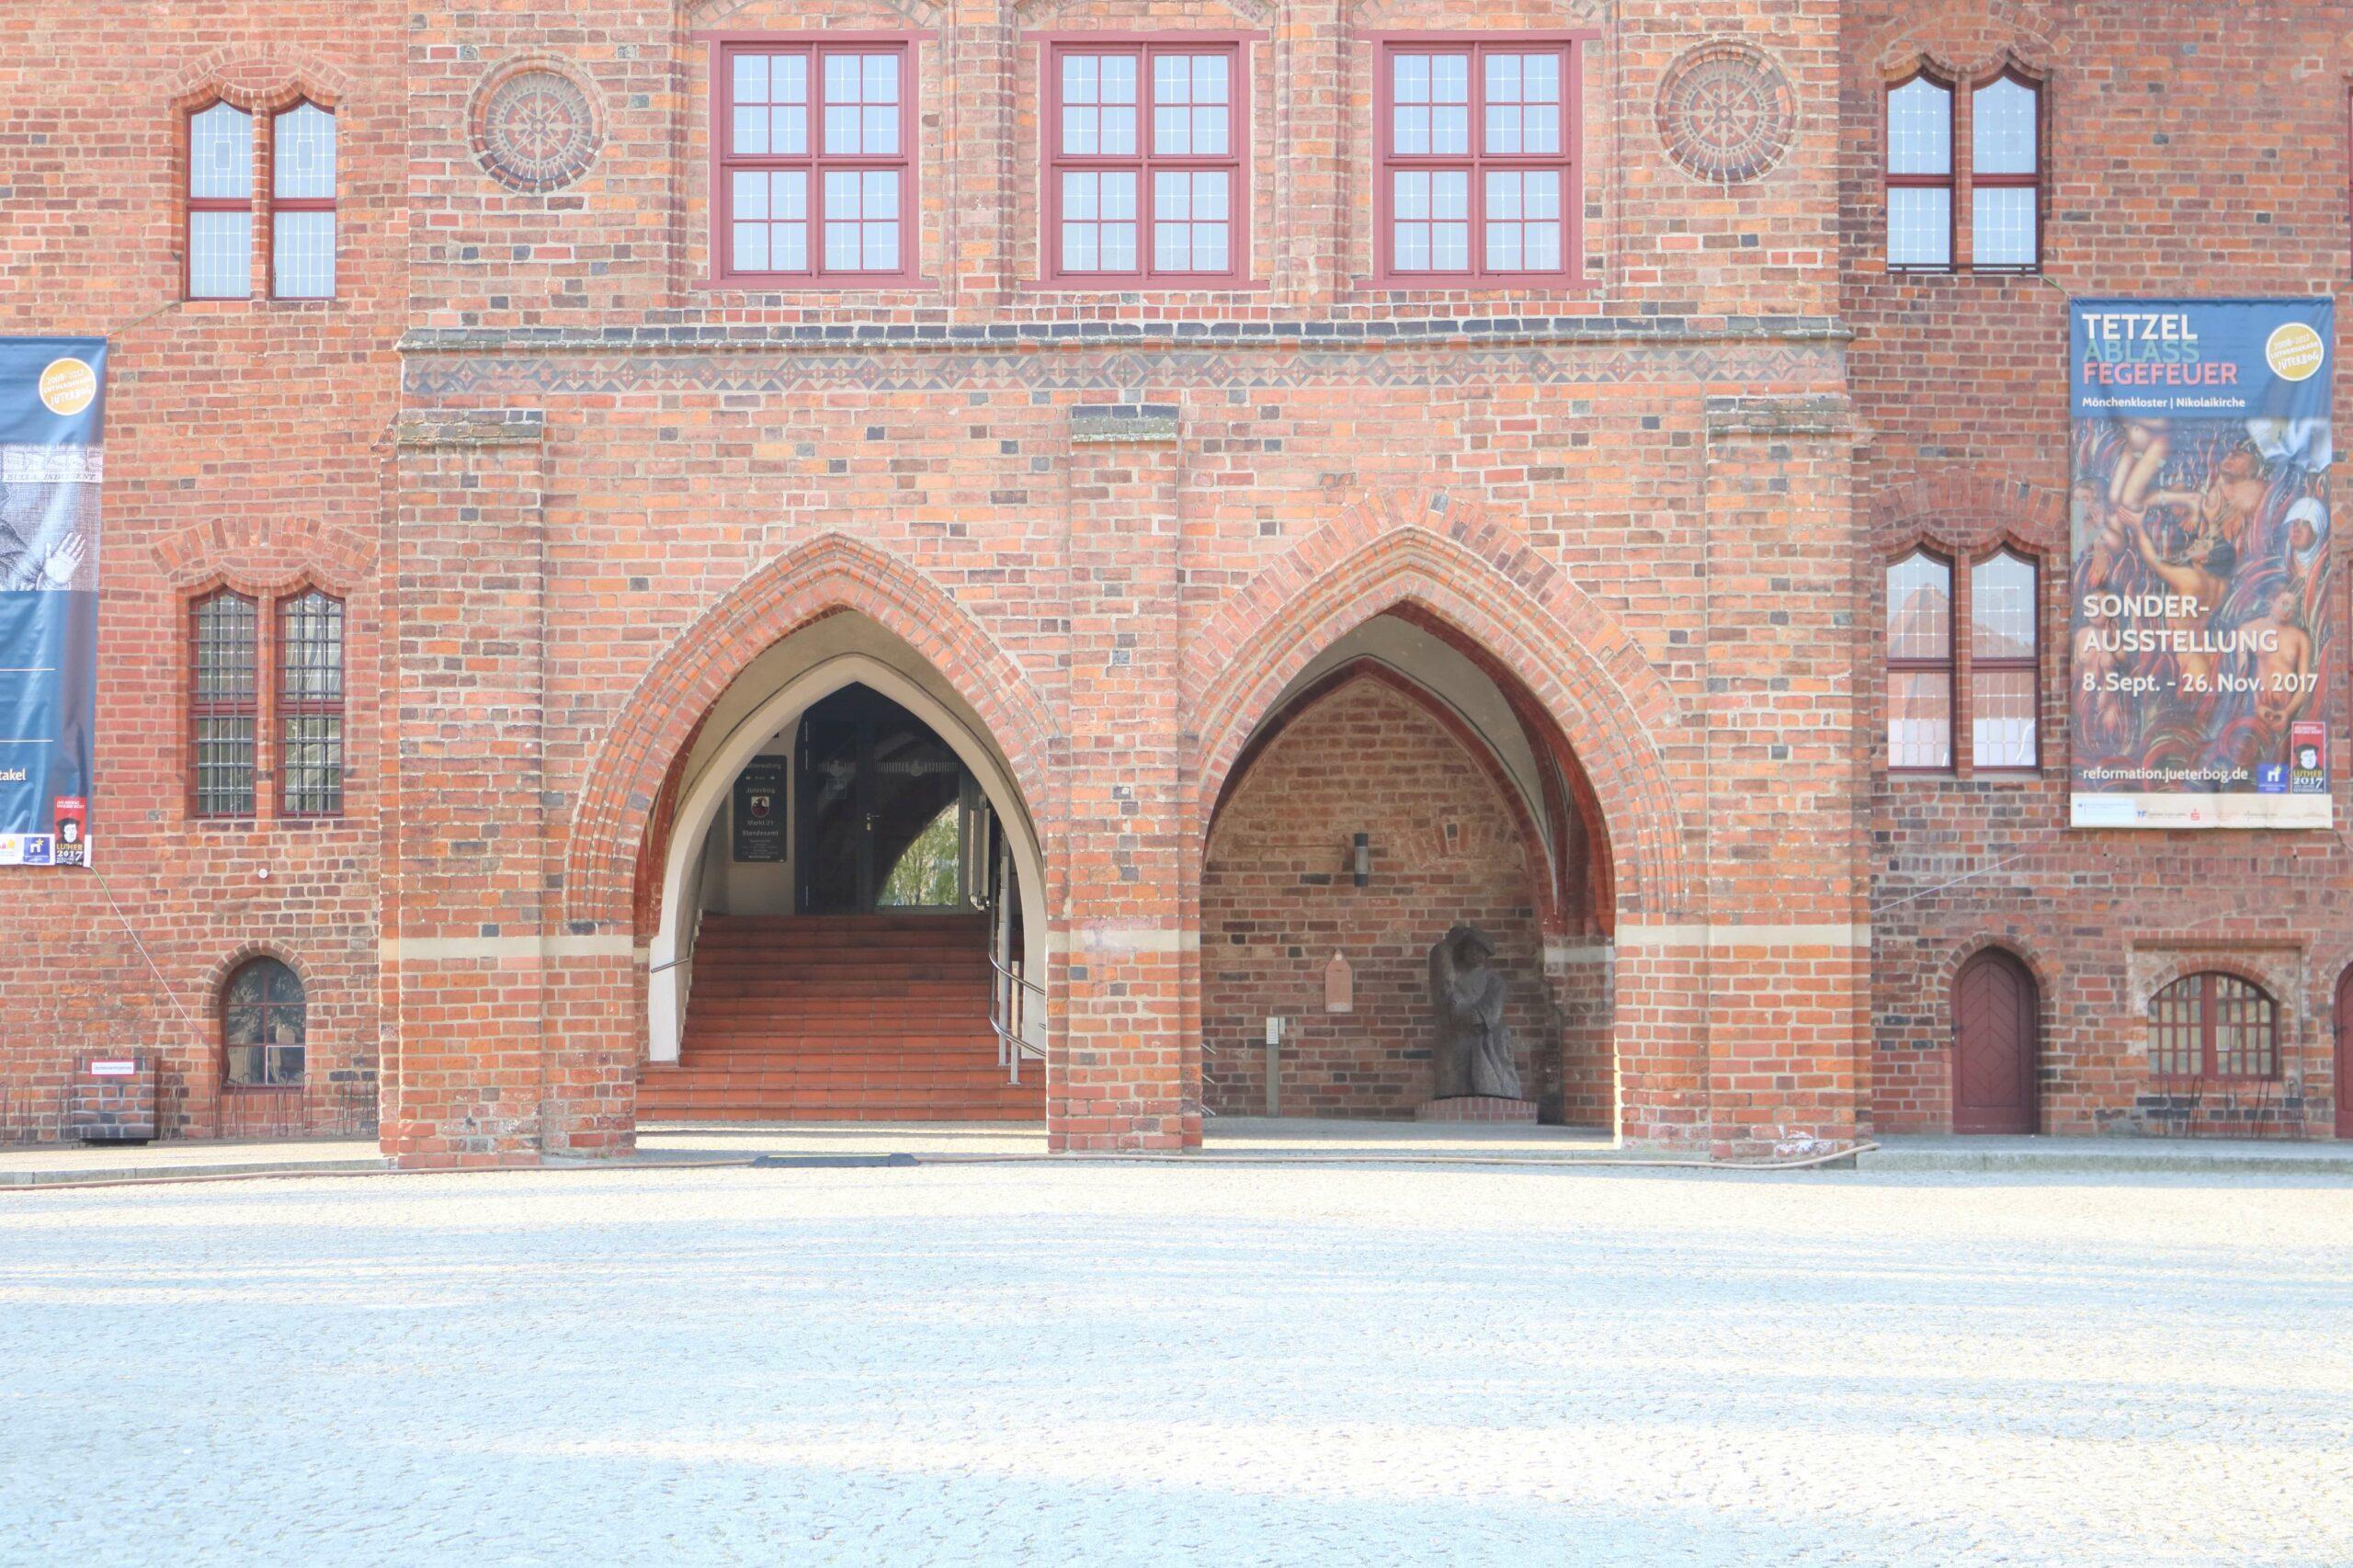 Bürgeramt Jüterbog - Markt 21